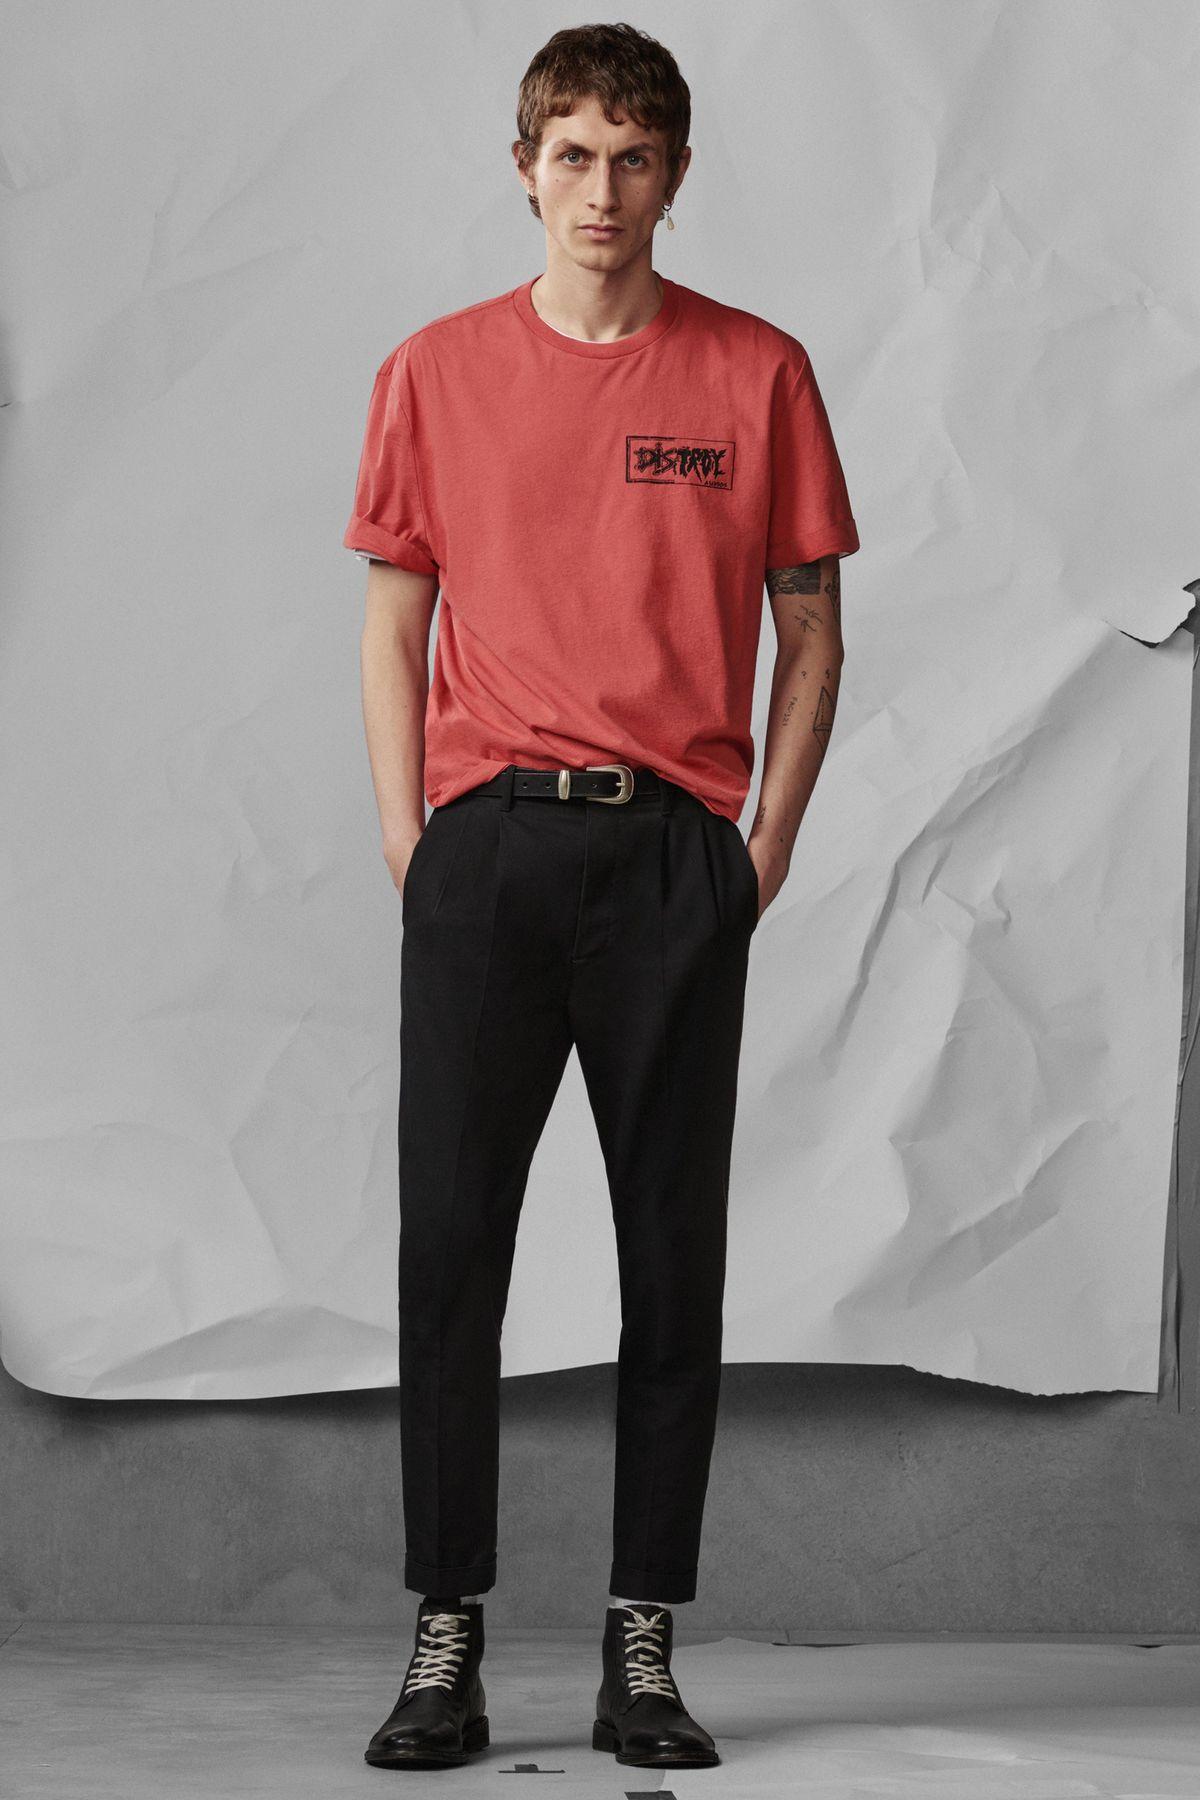 Distroy Crew T-Shirt , £45  Tallis Trouser , £108  Leven Boot , £168